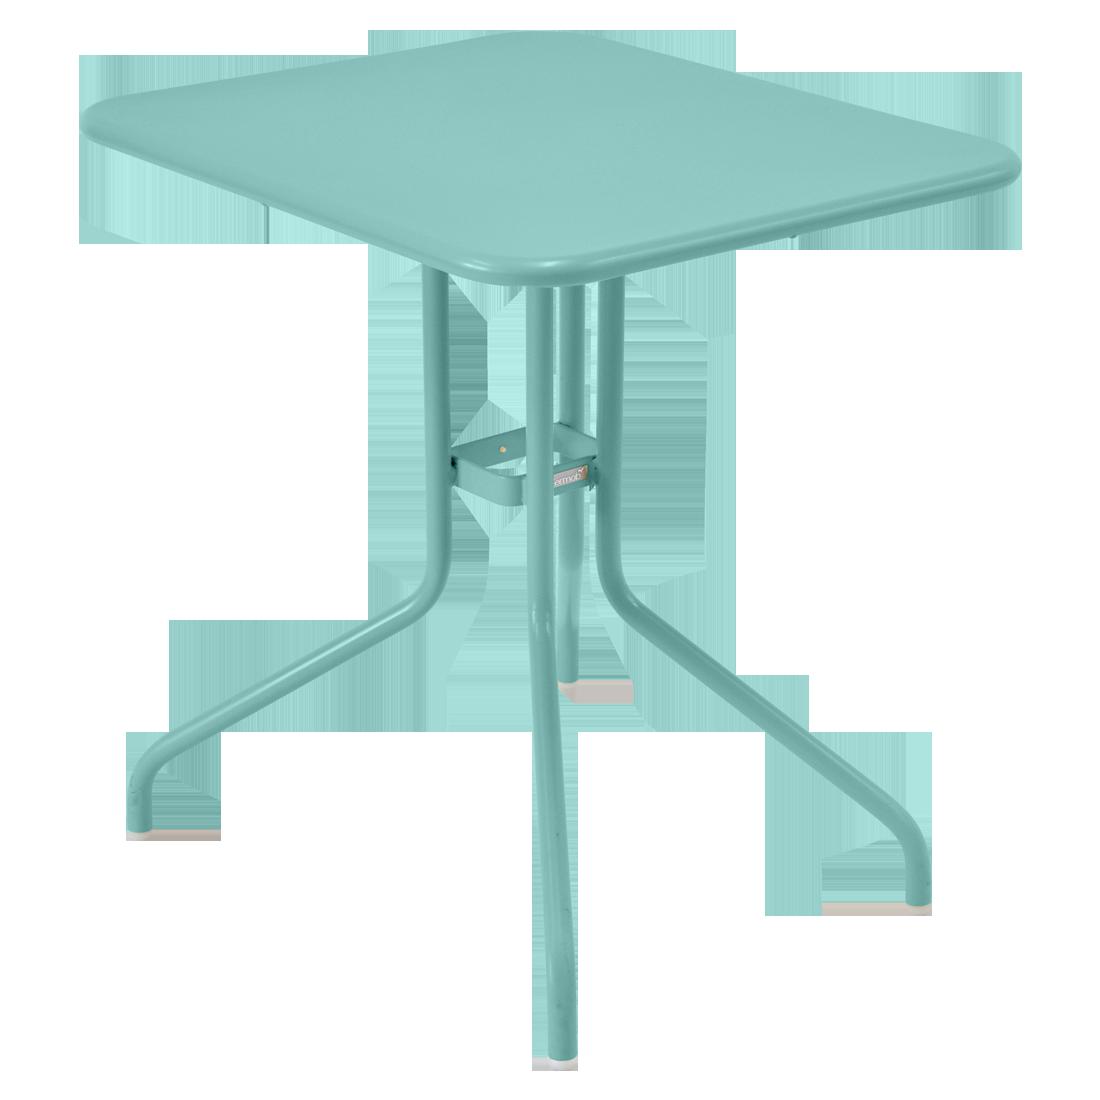 60x70 cm p tale table restaurant furniture